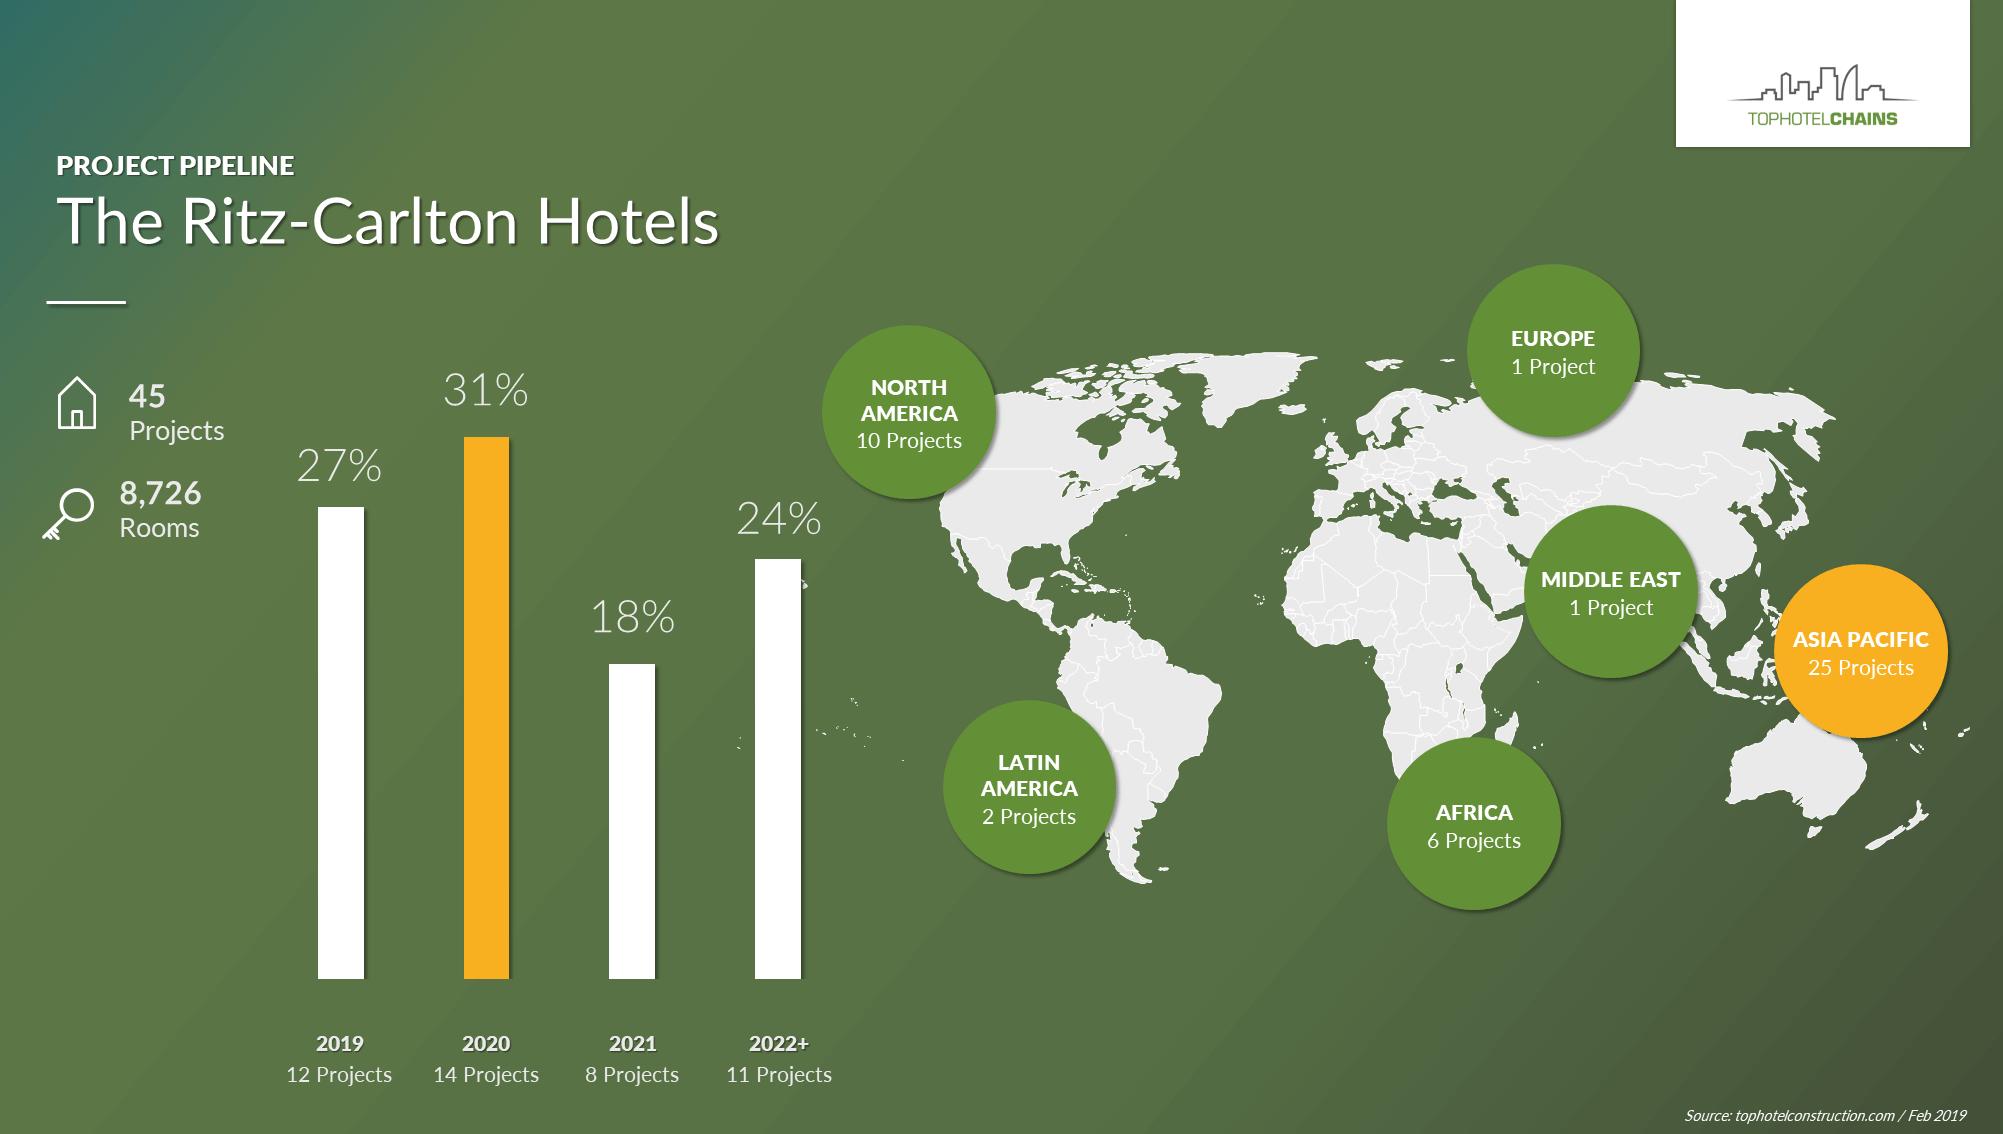 The Ritz-Carlton Hotels